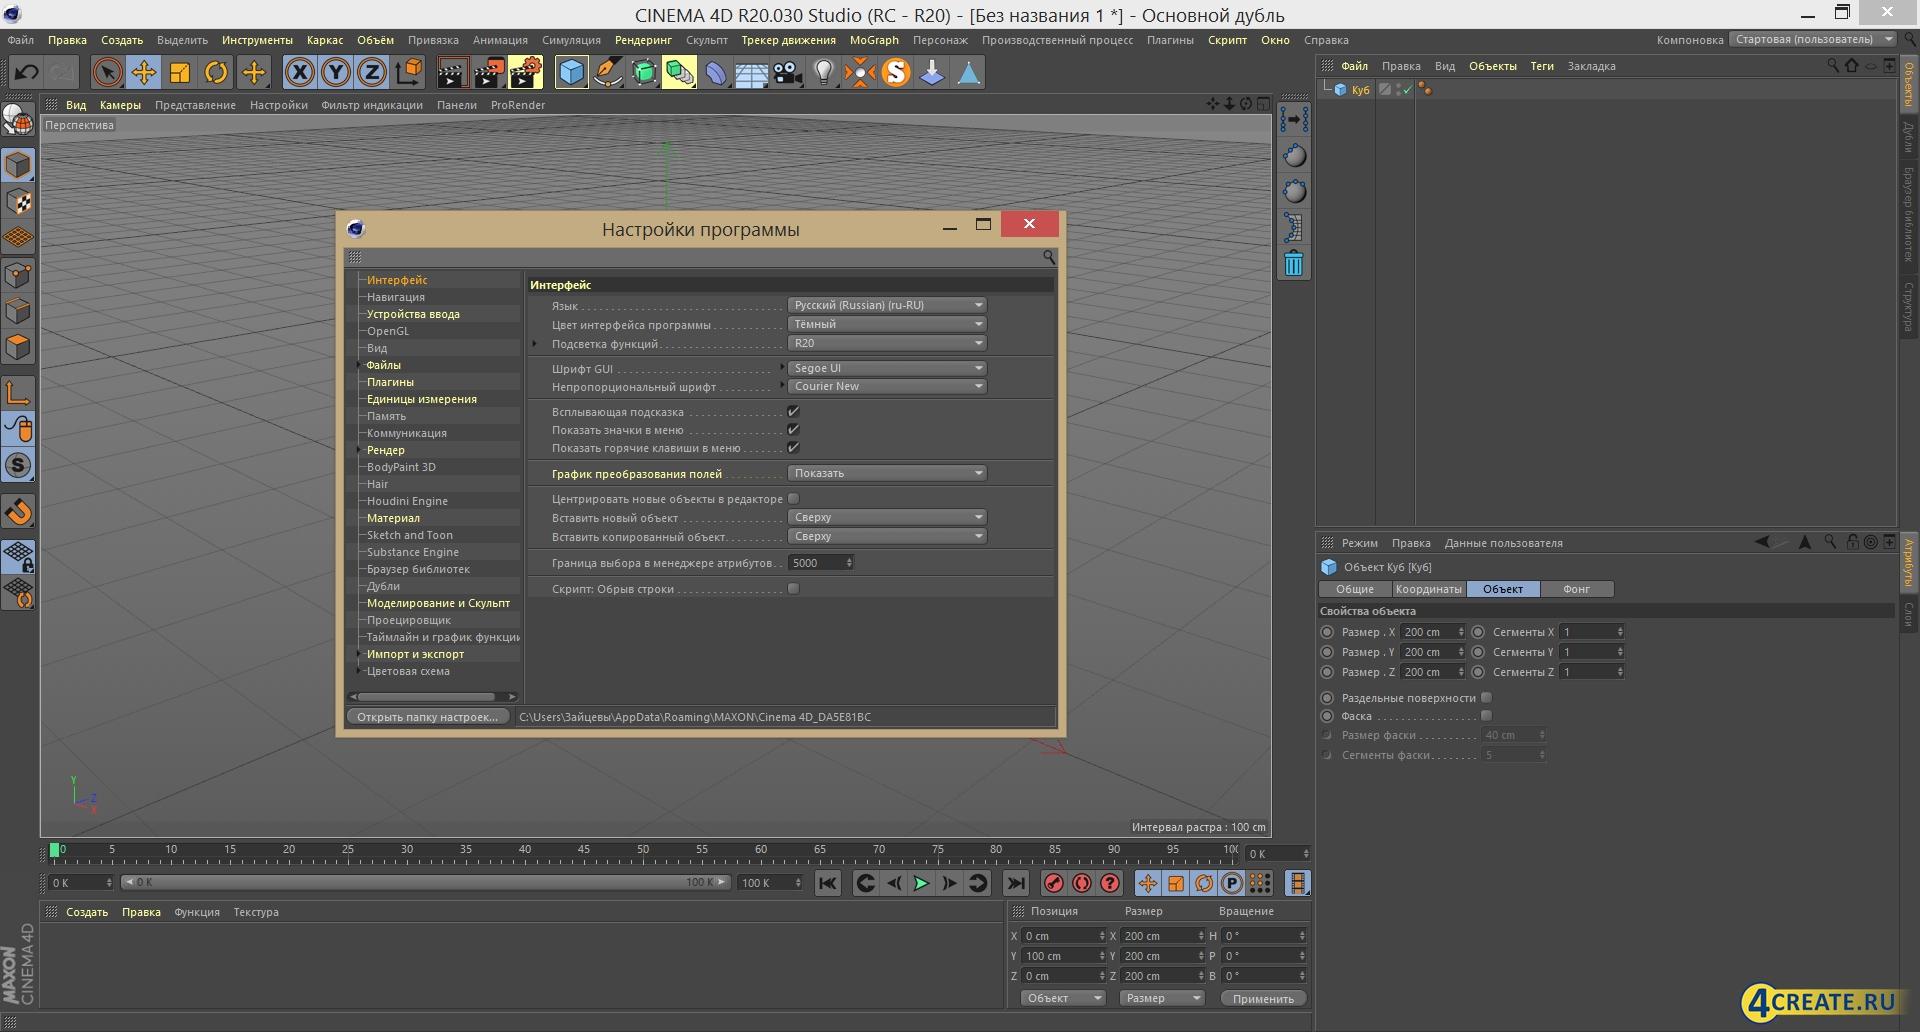 CINEMA 4D Studio R20.030 (Скриншот 2)